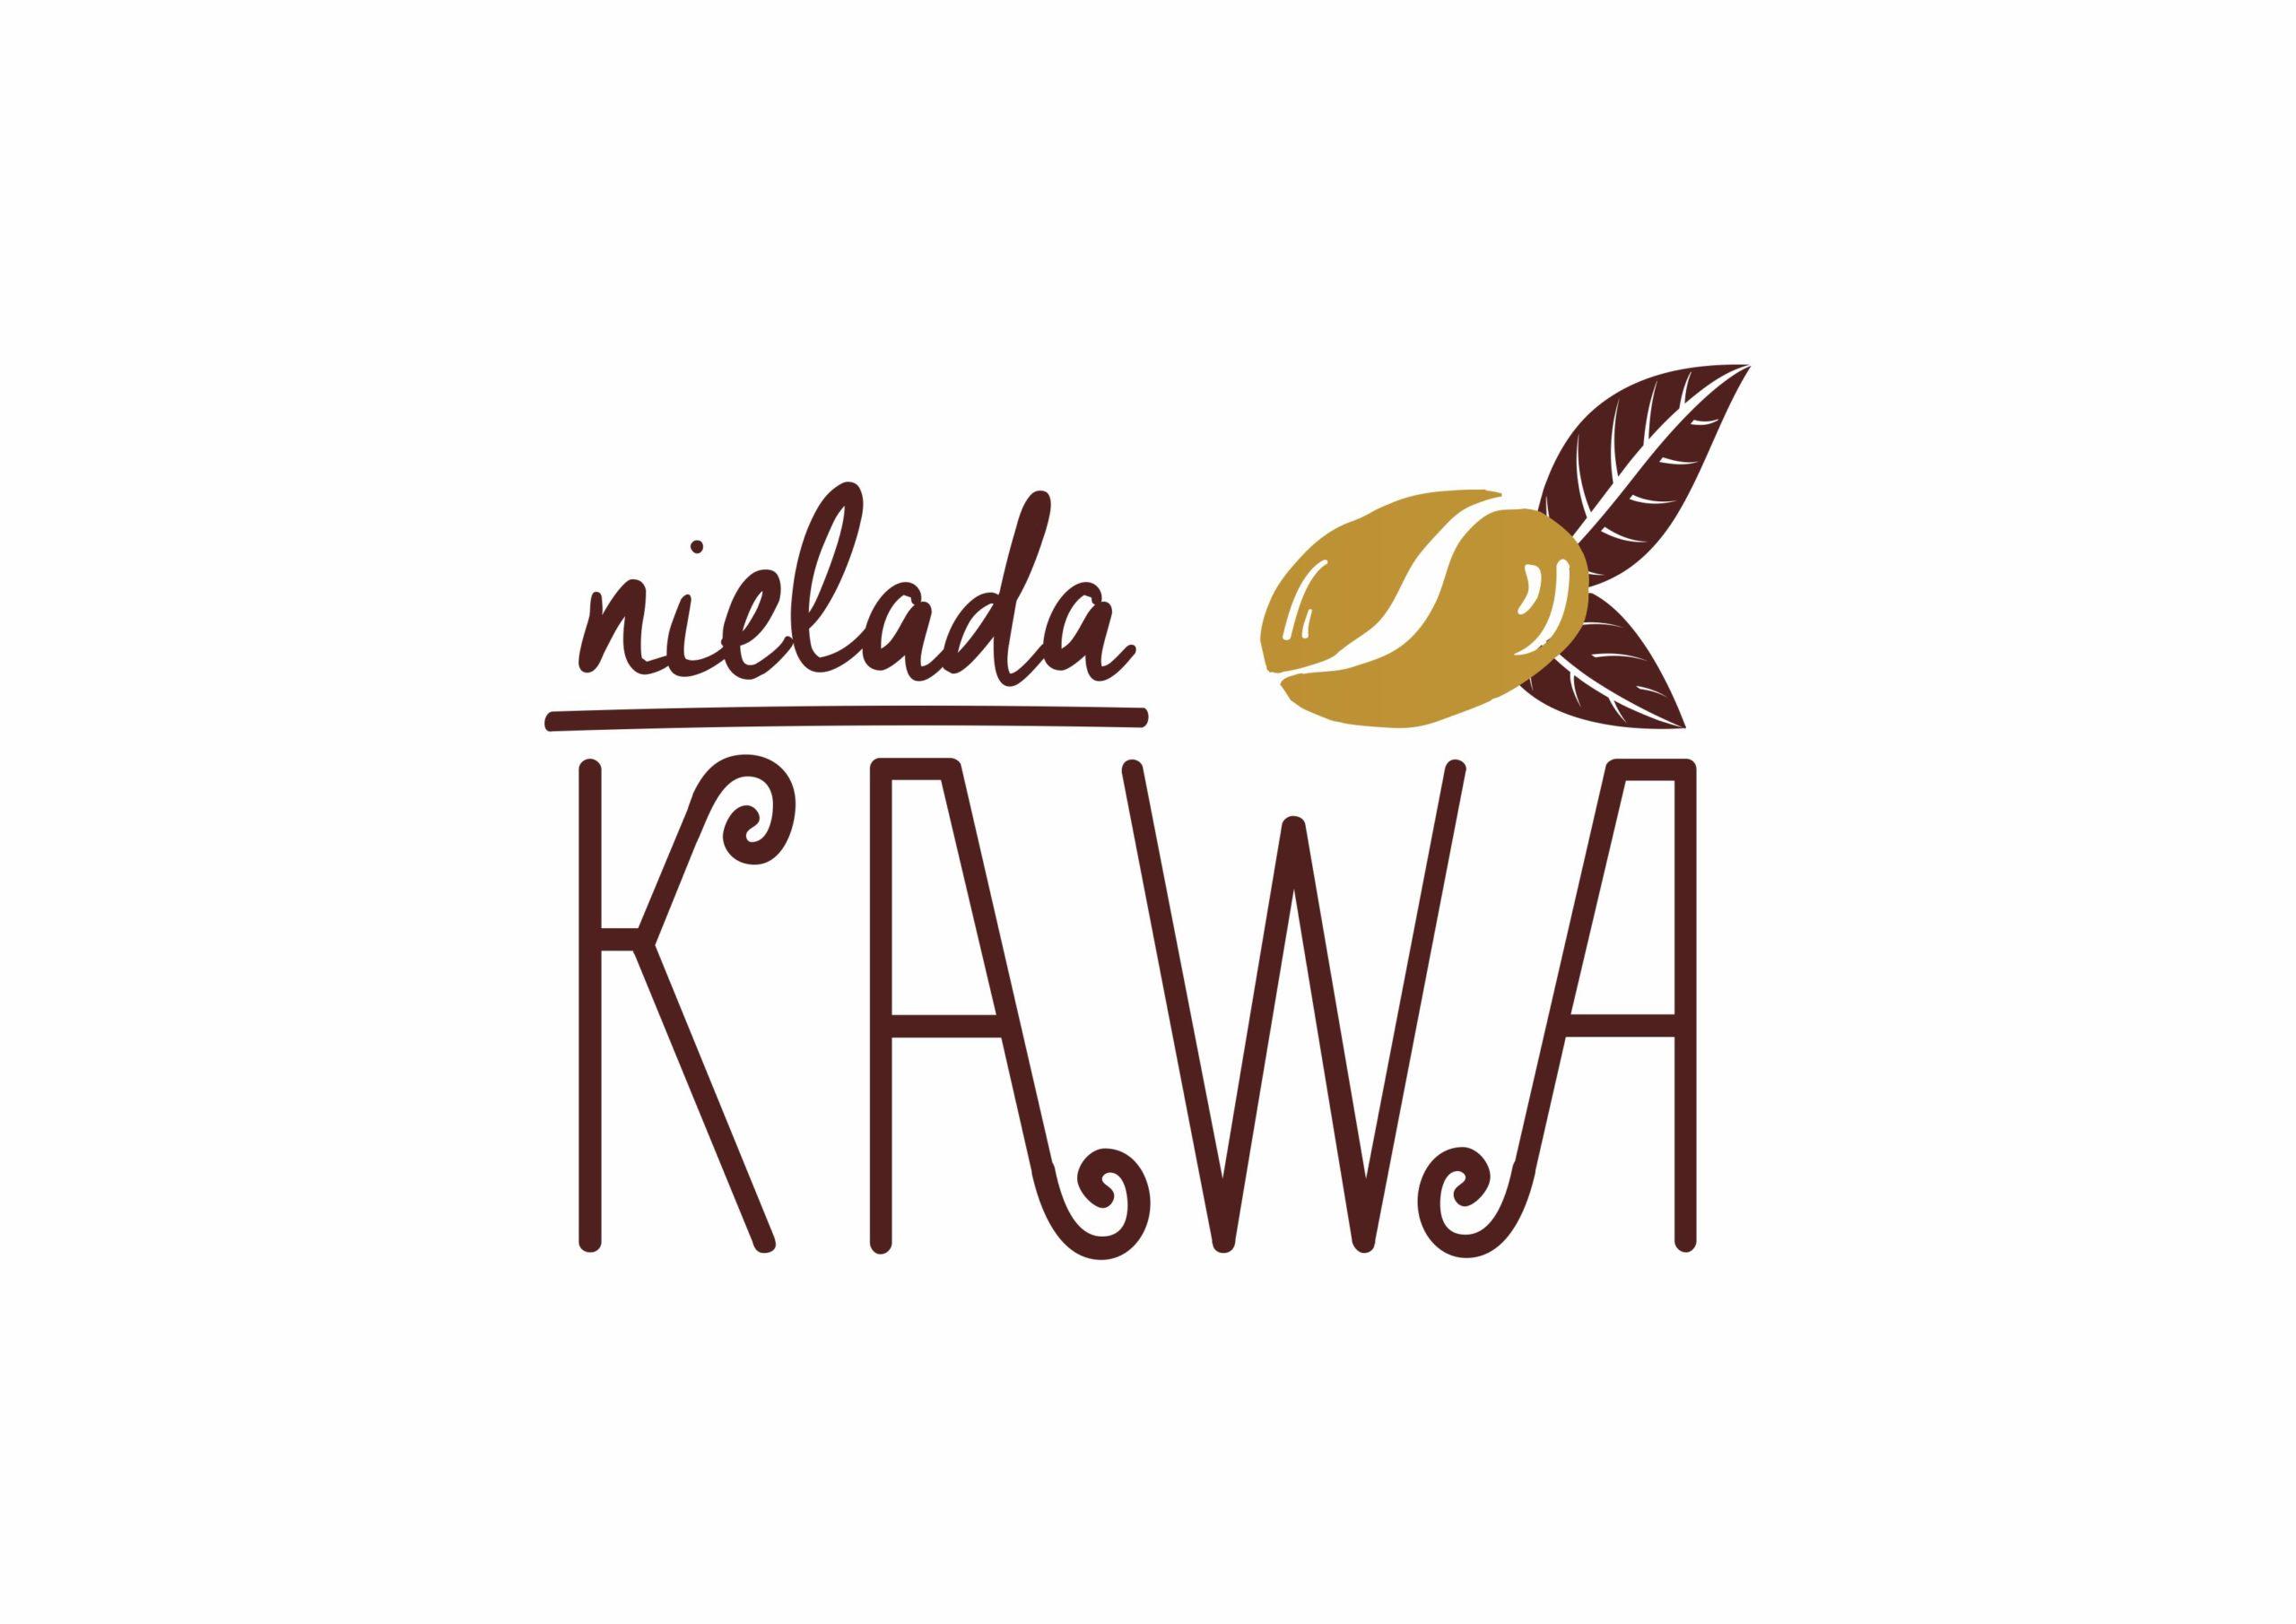 Nielada Kawa